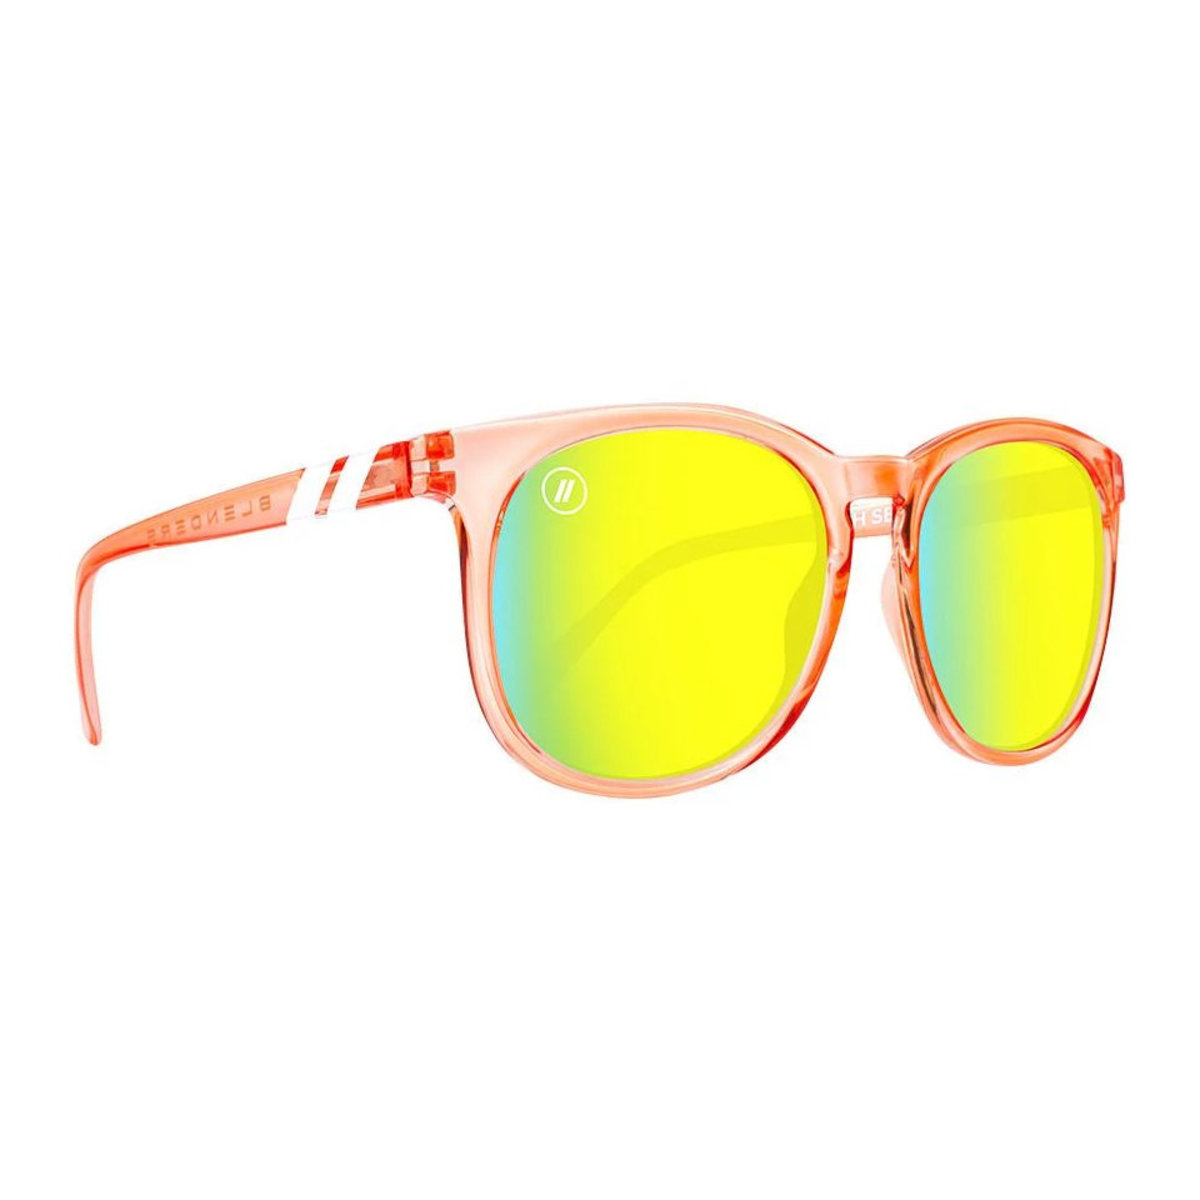 H Series // Secret Paradise Polarized Sunglasses